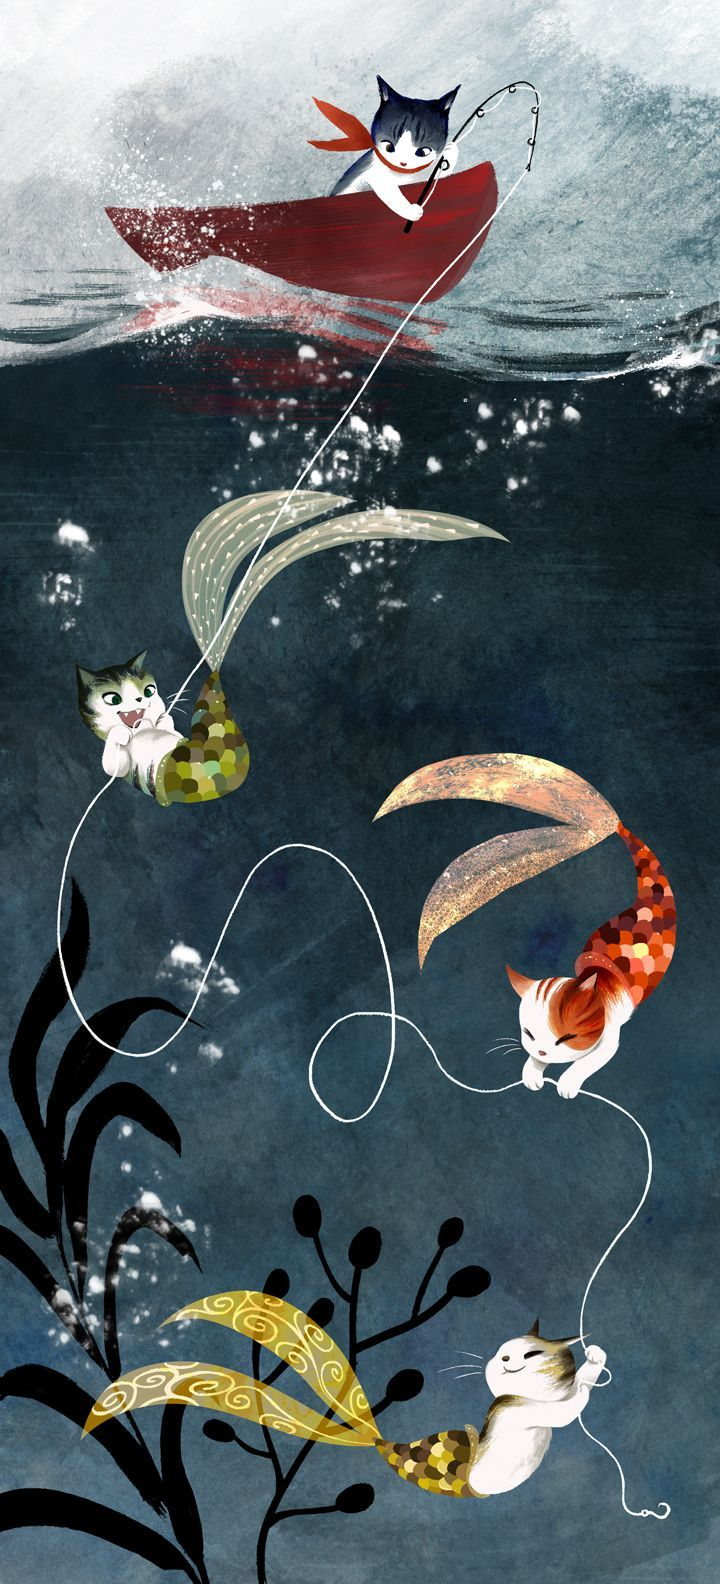 Catfish by ArtbyVW